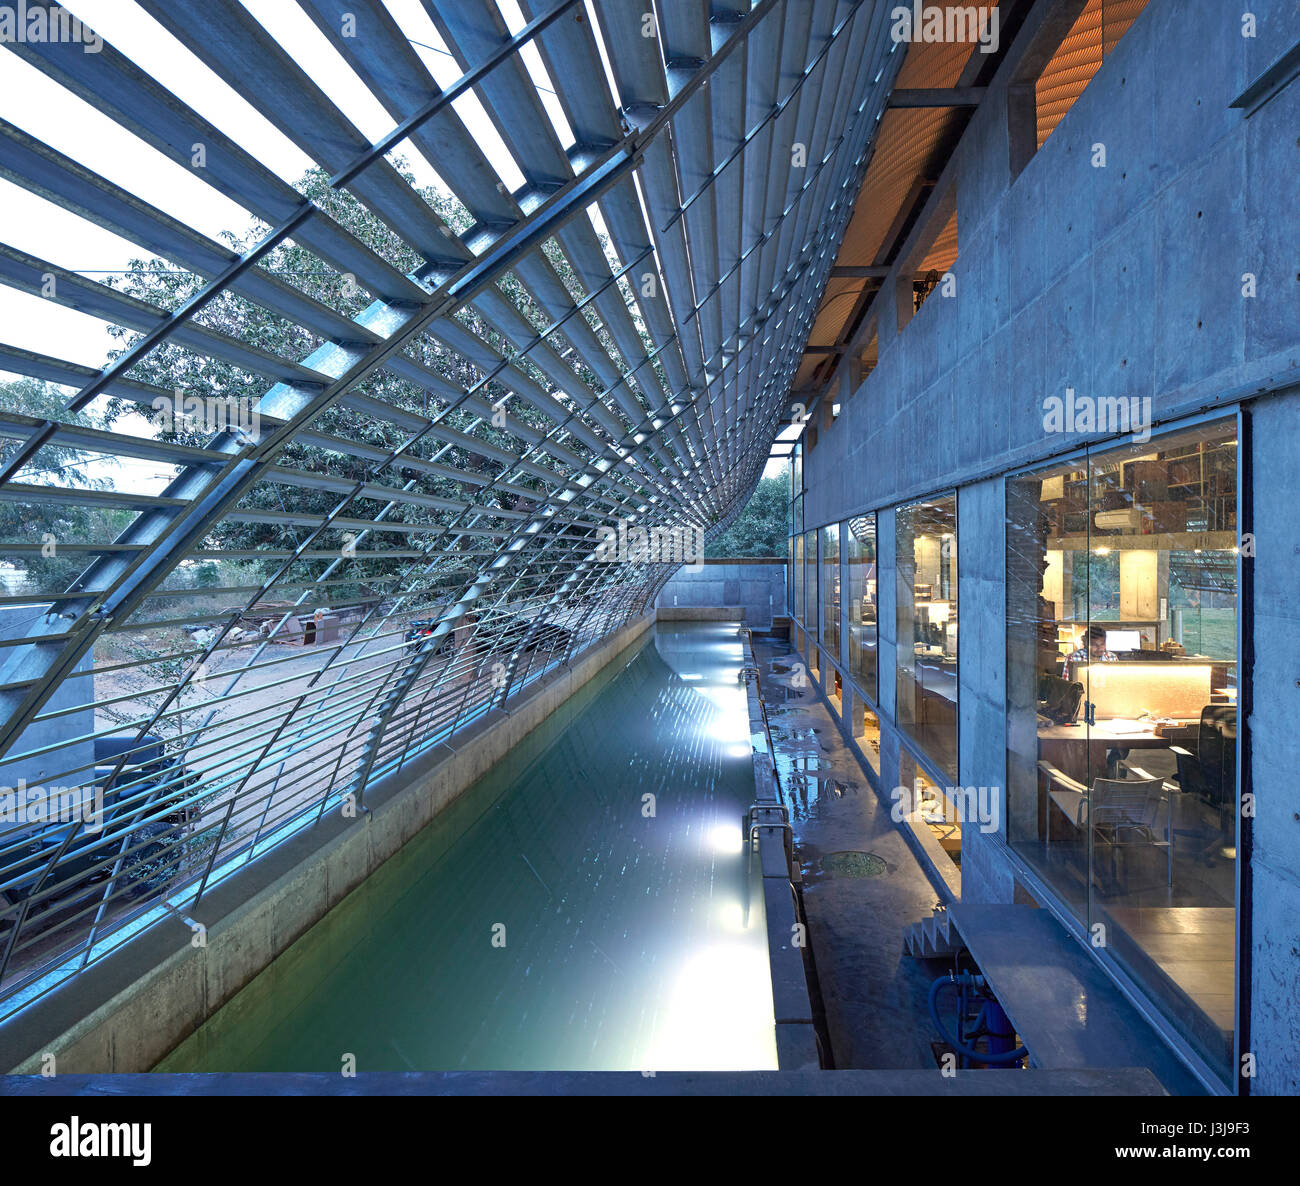 Entrance area under steel canopy with pool towards dusk. The Pool Studio of Matharoo Associates, Ahmedabad, India. - Stock Image